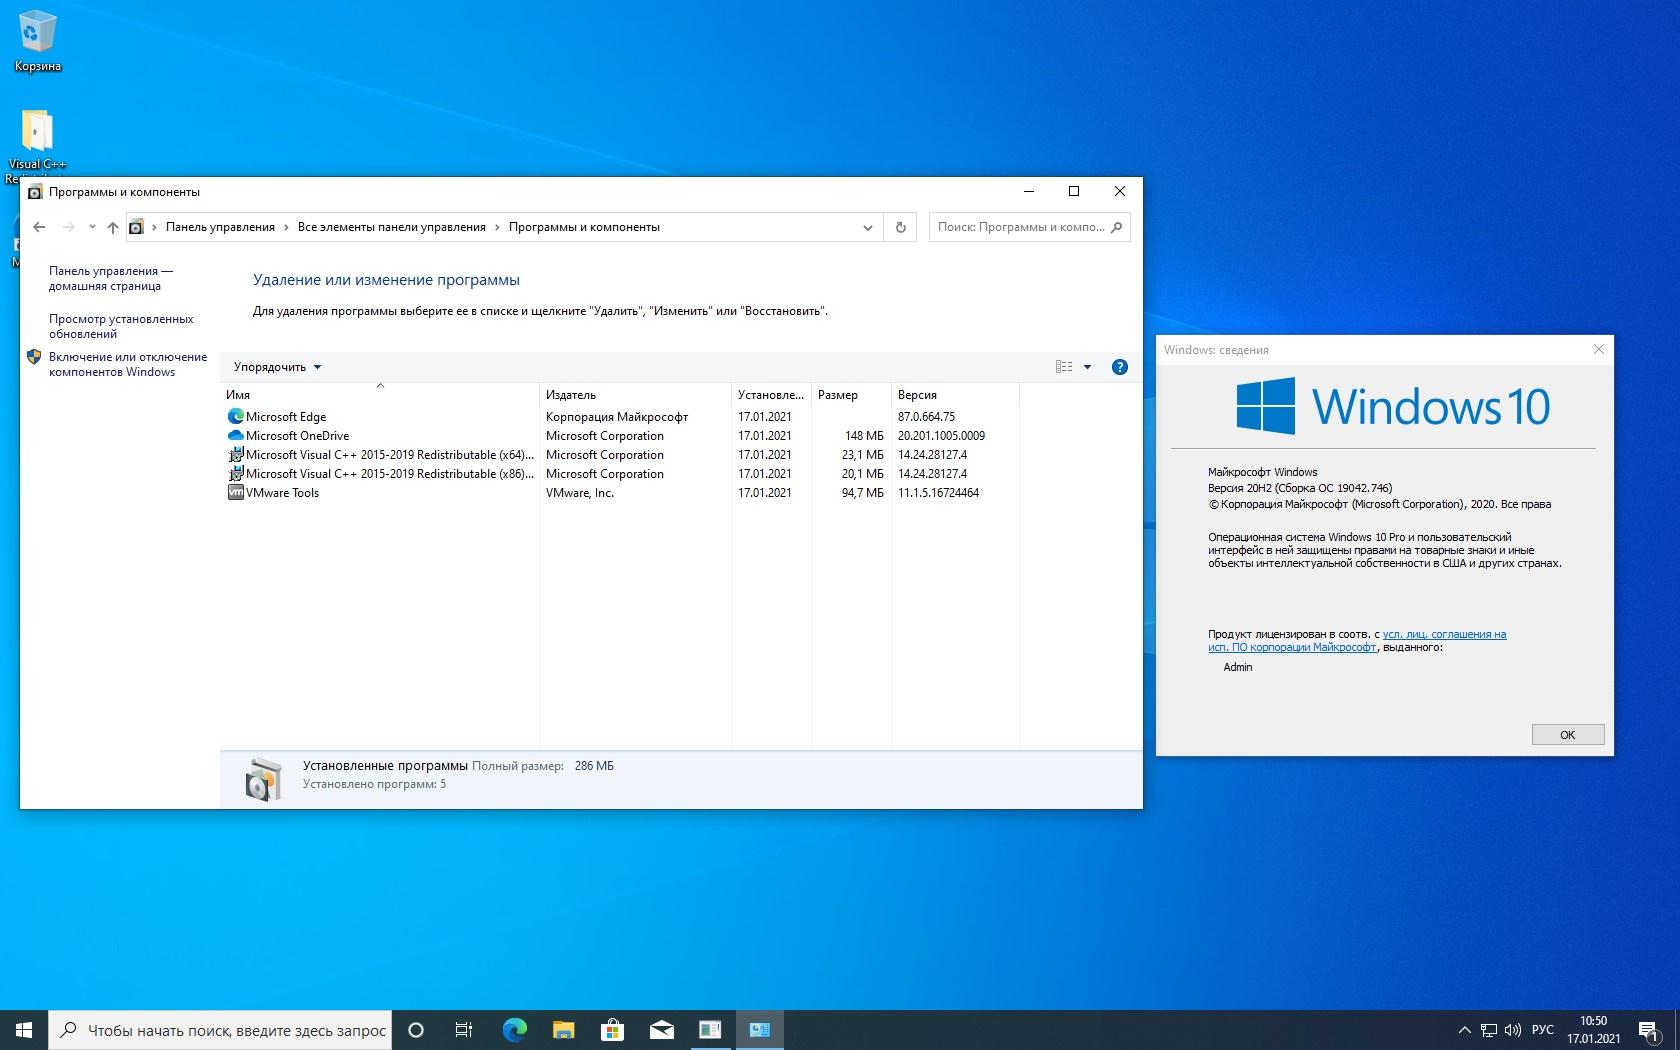 Windows 10 20H2 (Build 19042.746) (40in2) x86/x64 by Sergei Strelec на русском